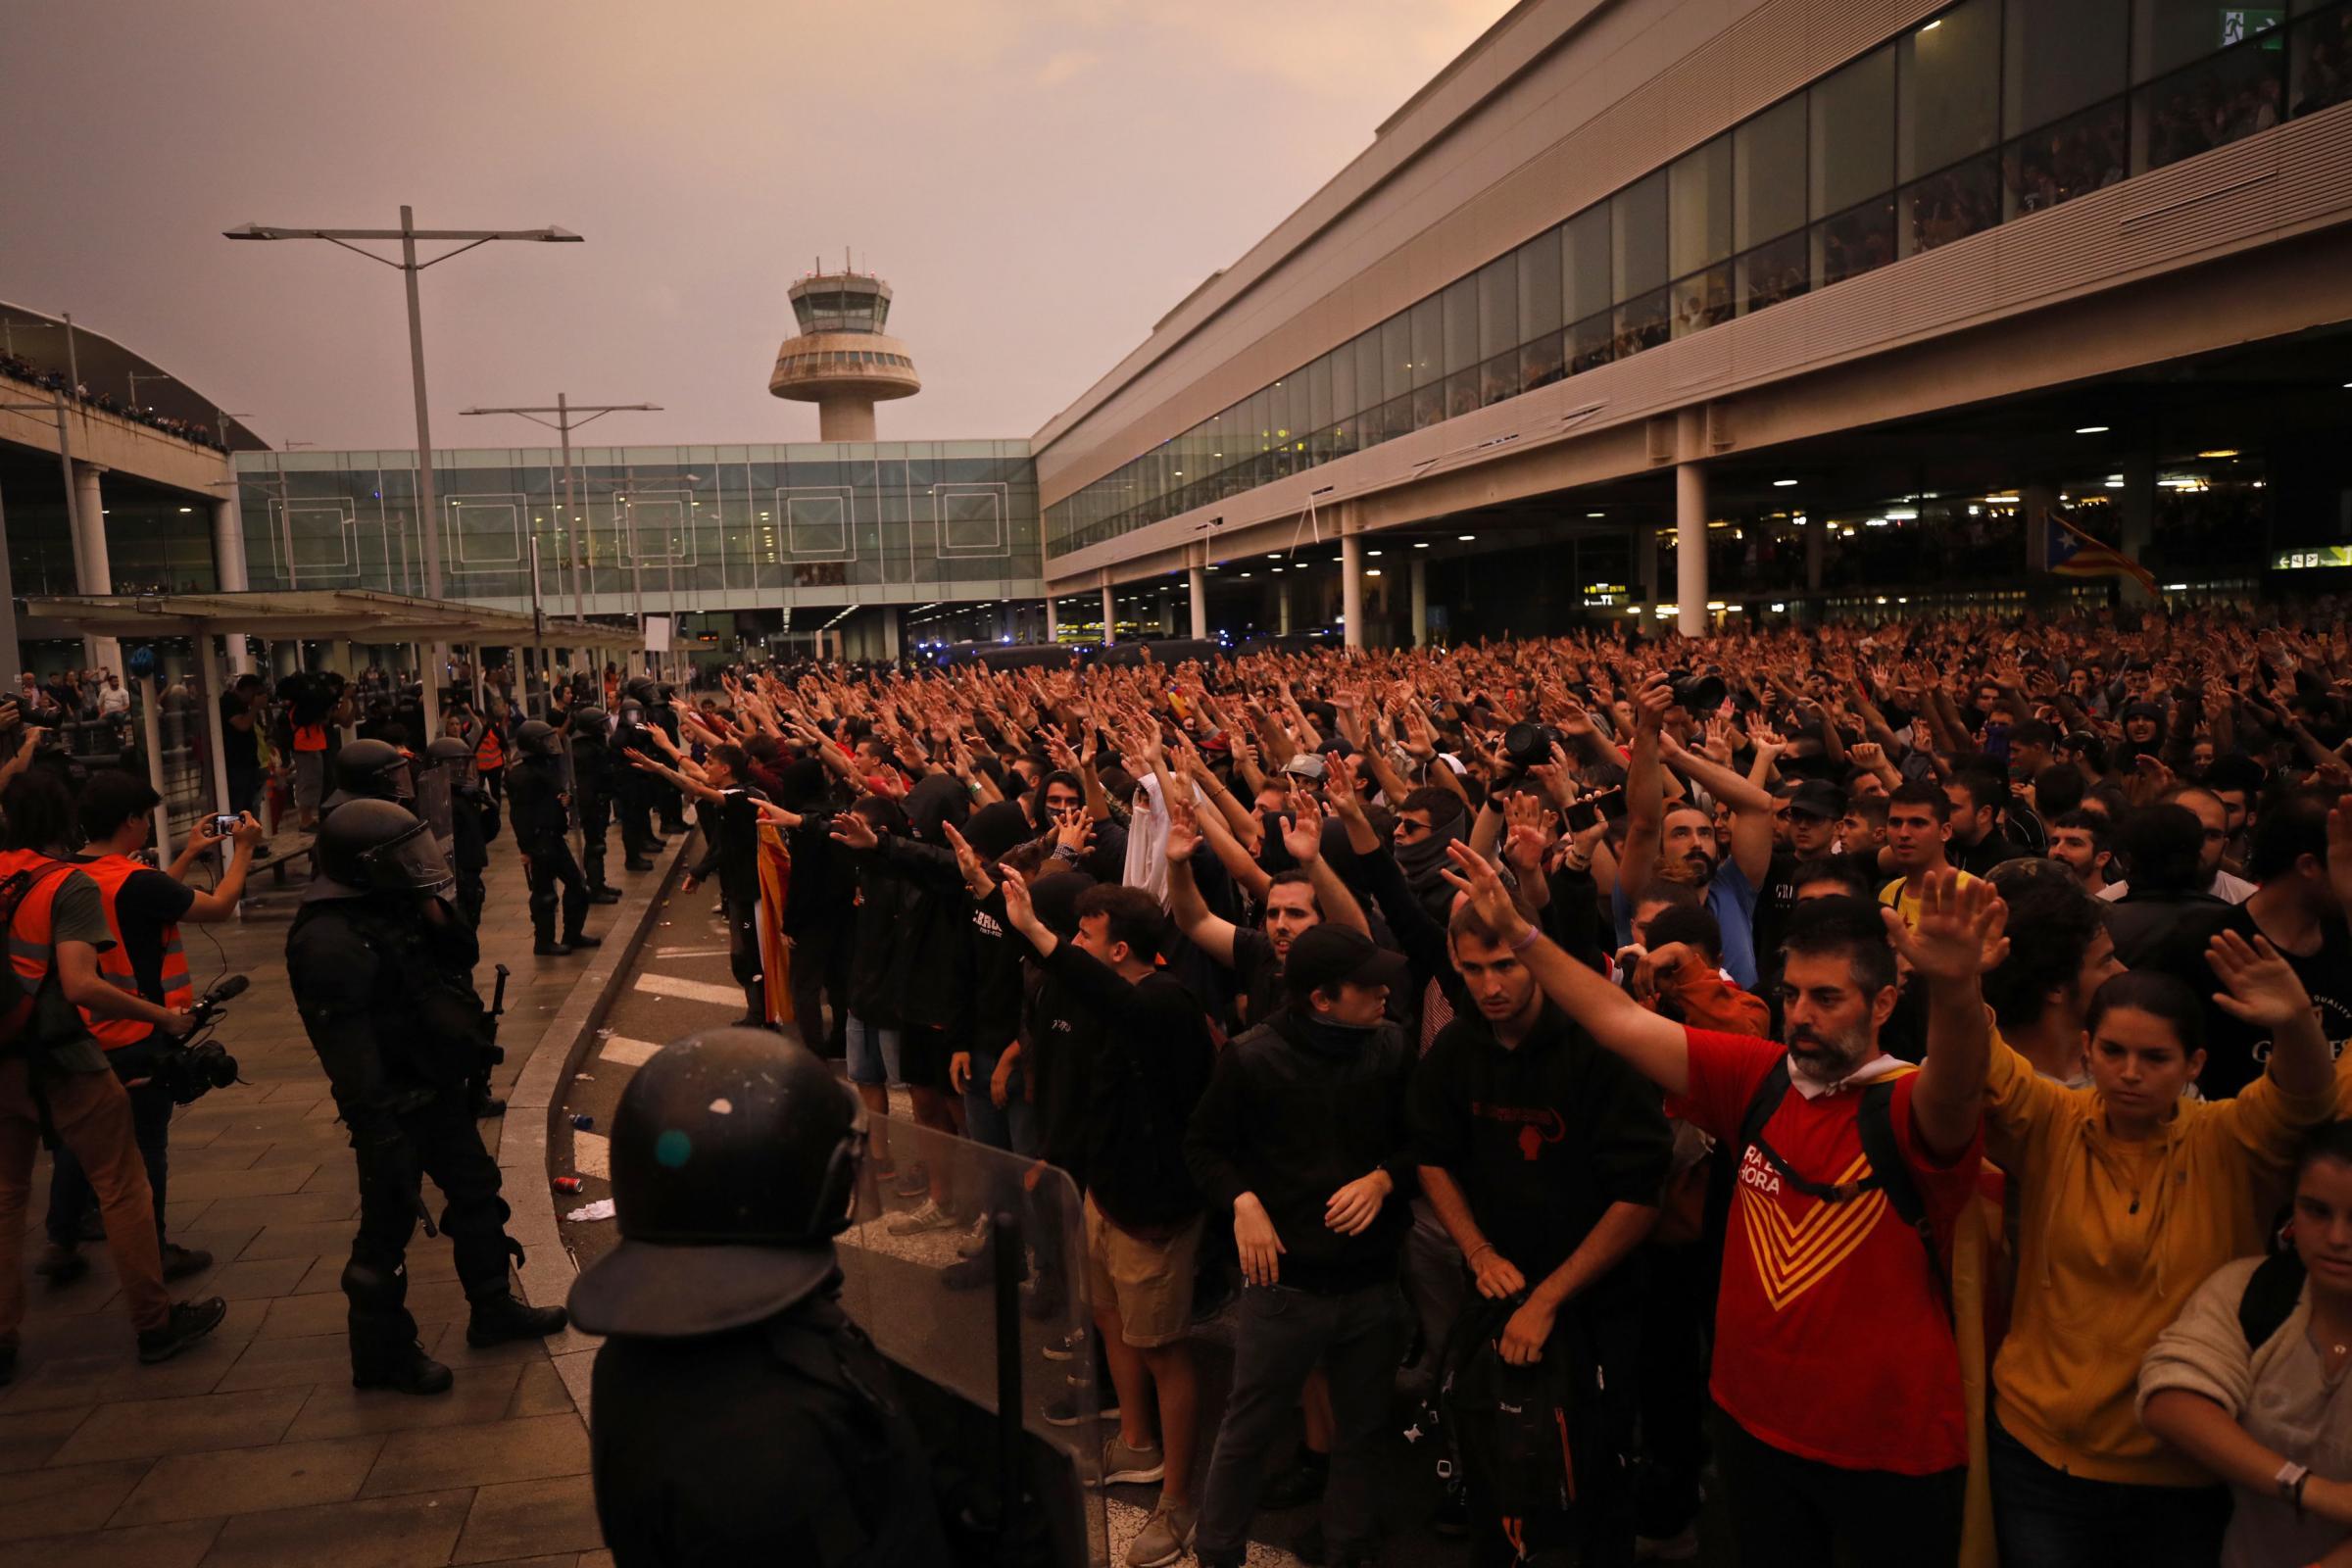 Catalans mount huge protests after independence leaders jailed